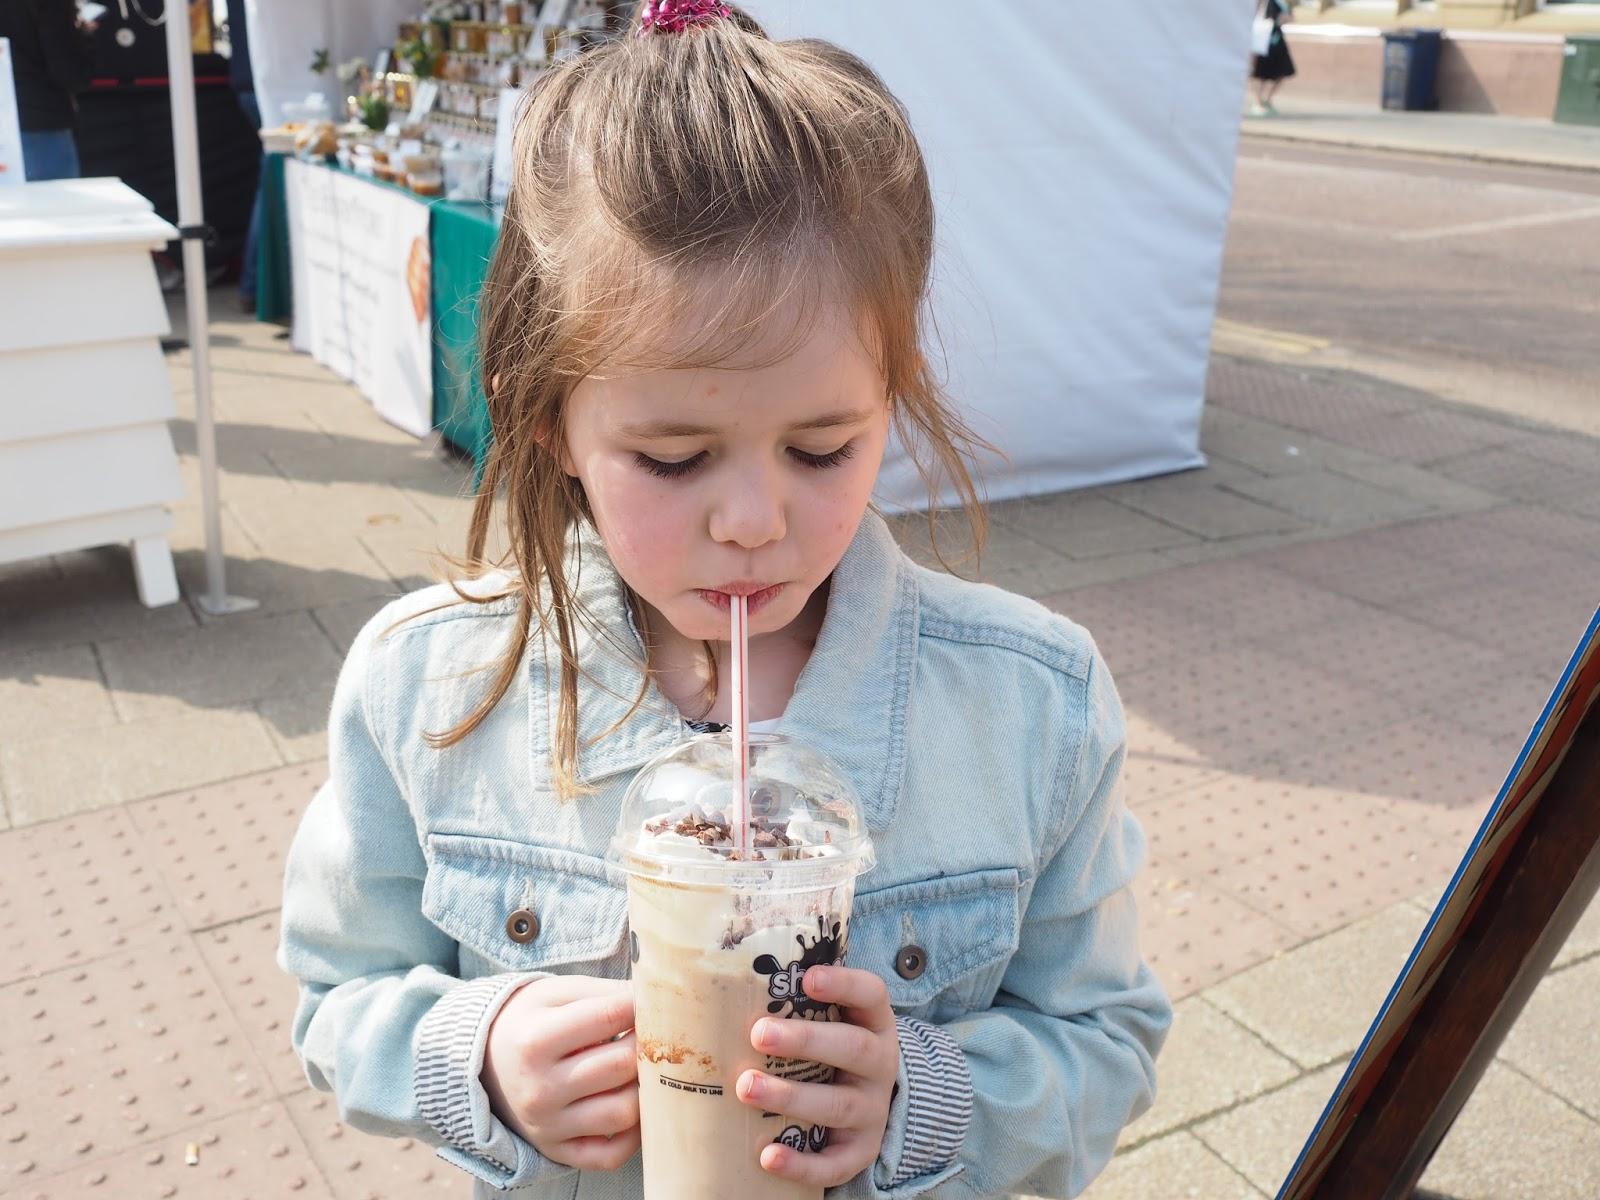 waffle co milkshake newcastle quayside street food market